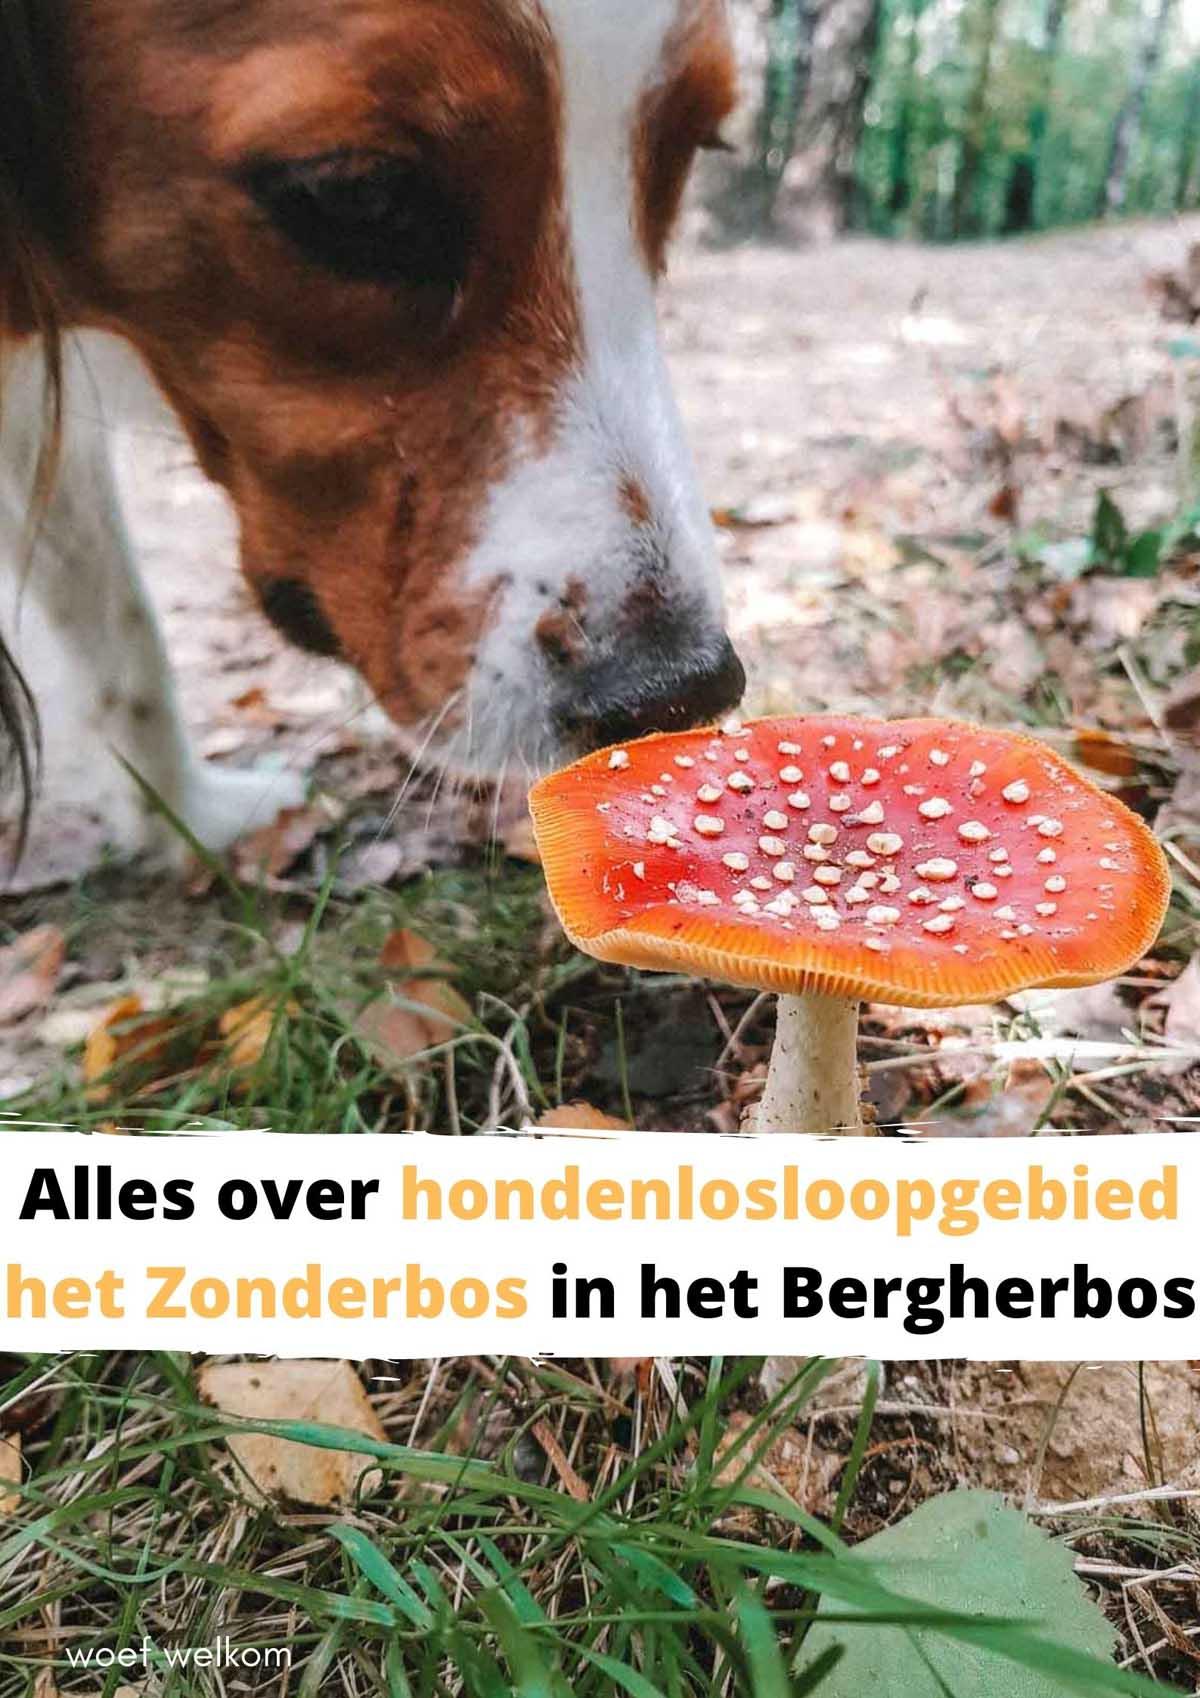 Alles over hondenlosloopgebied het Zonderbos in het Bergherbos